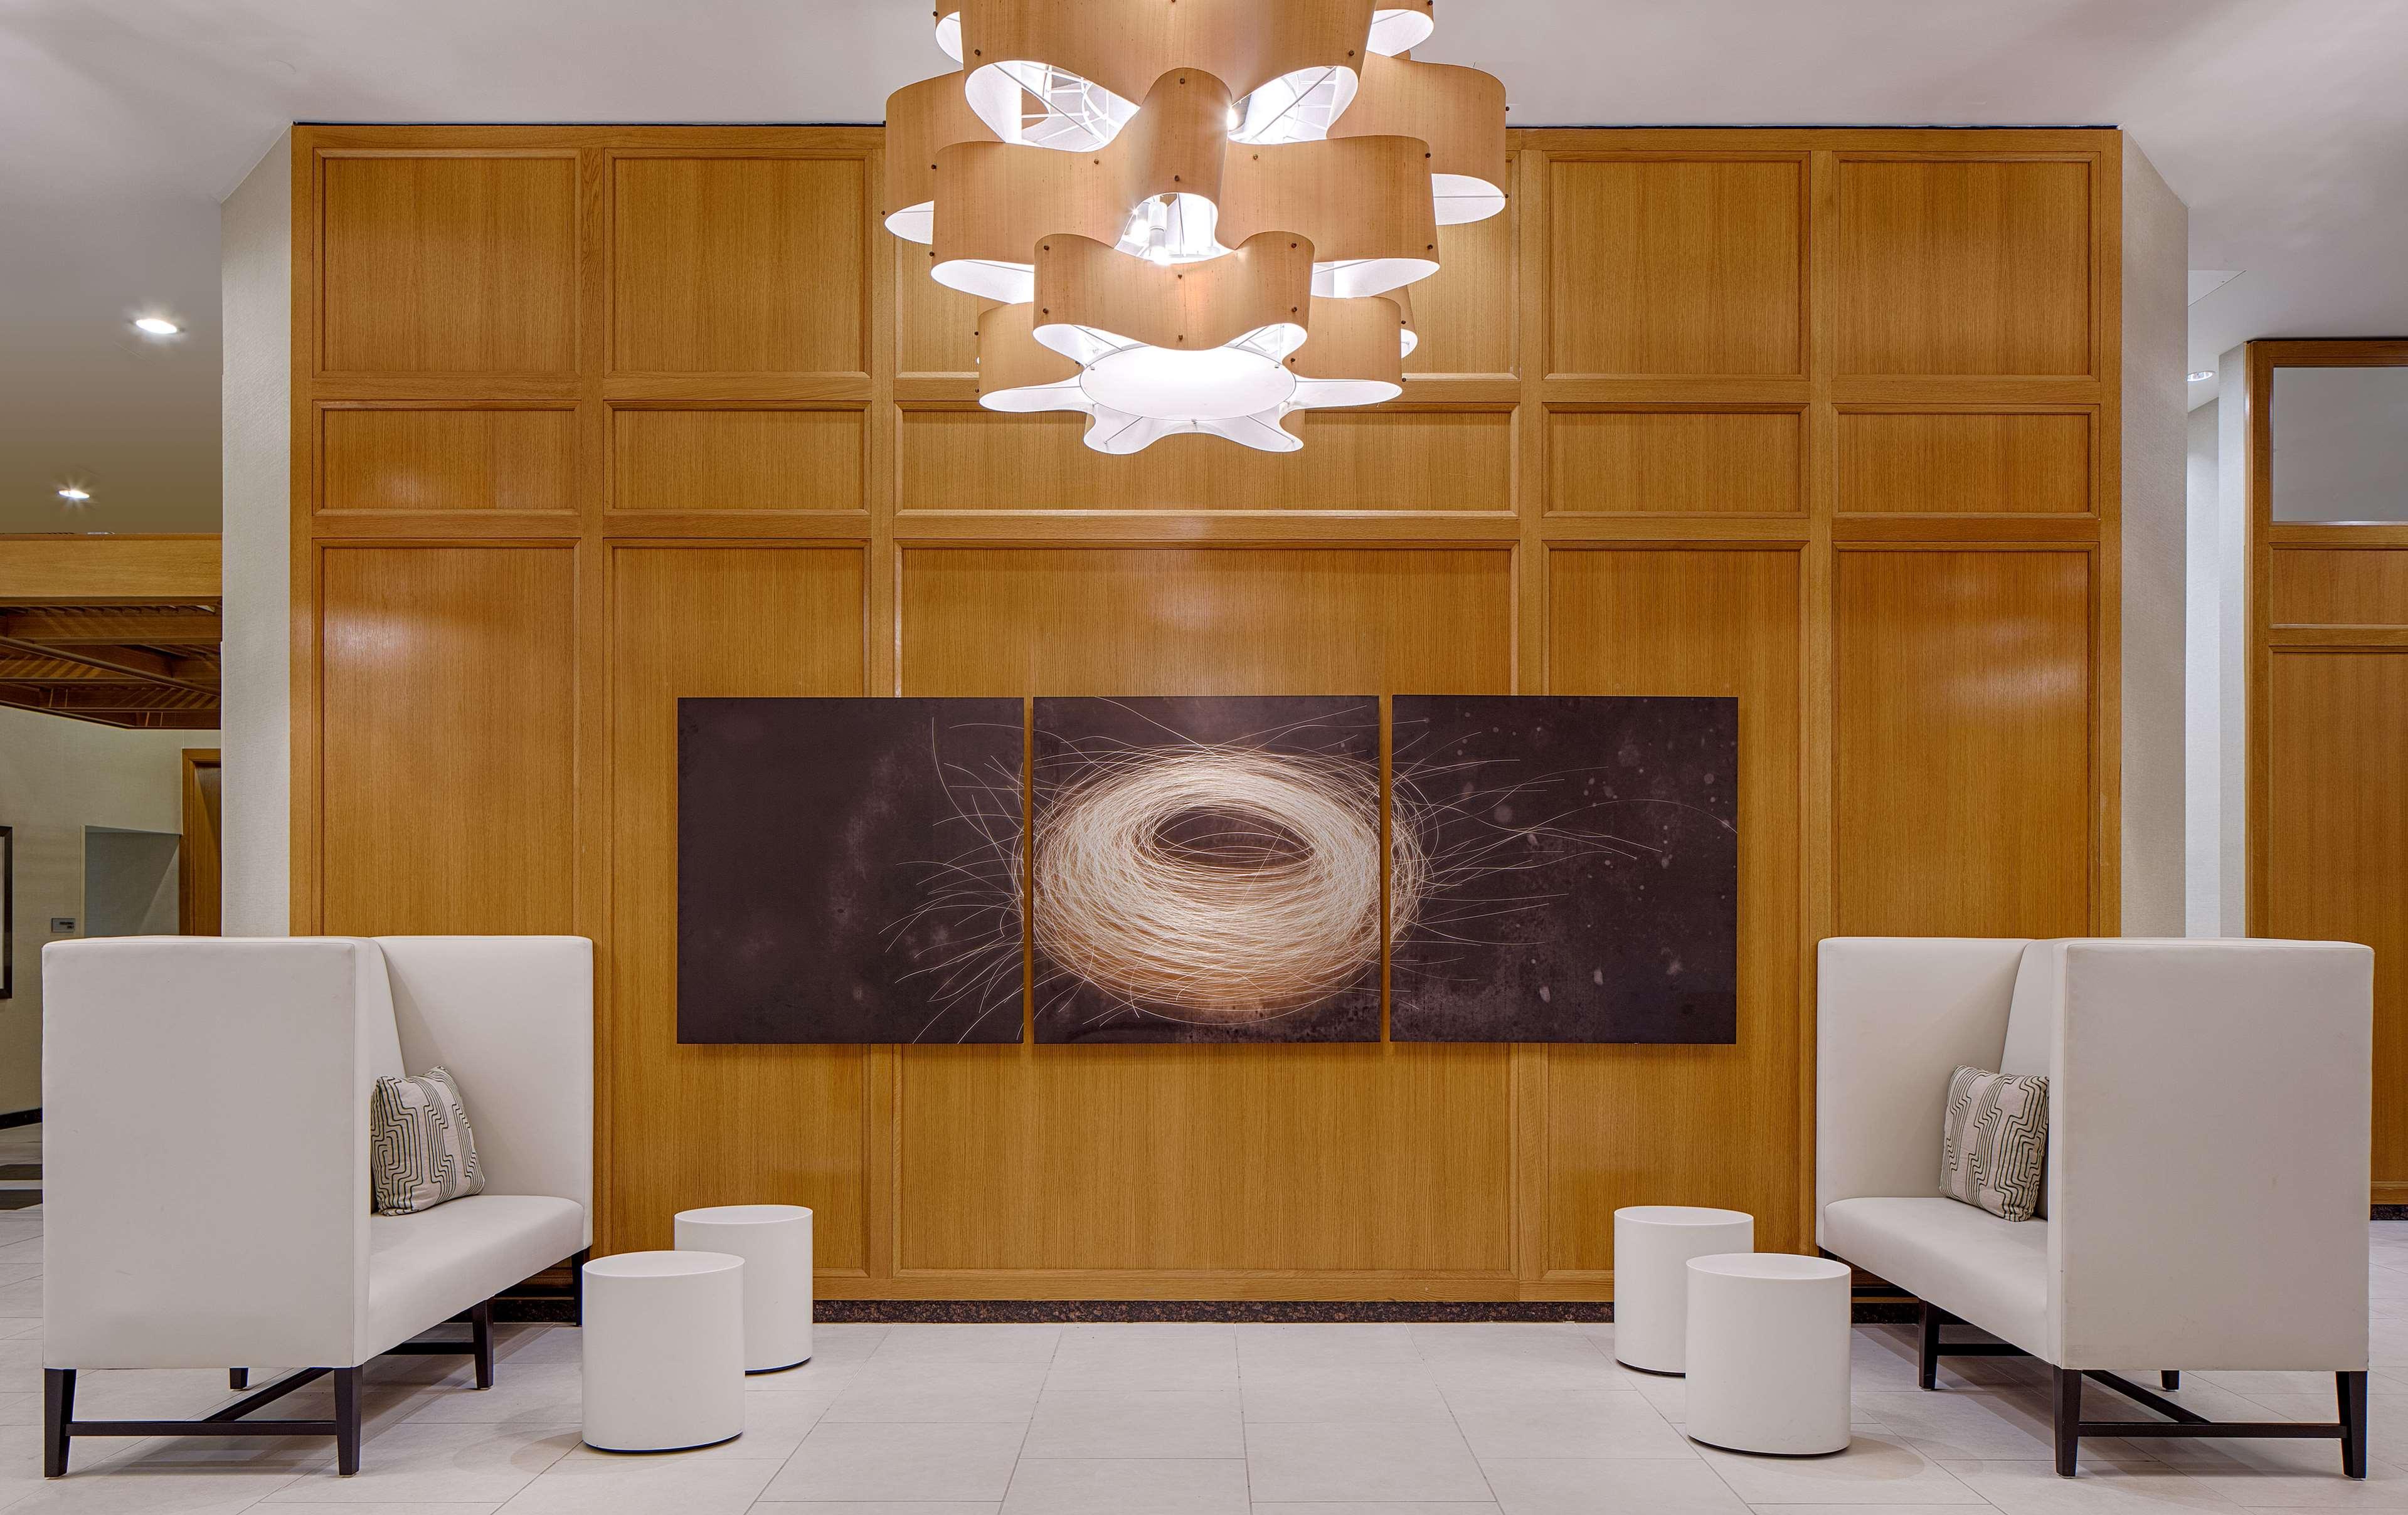 DoubleTree by Hilton Hotel Houston - Greenway Plaza image 1